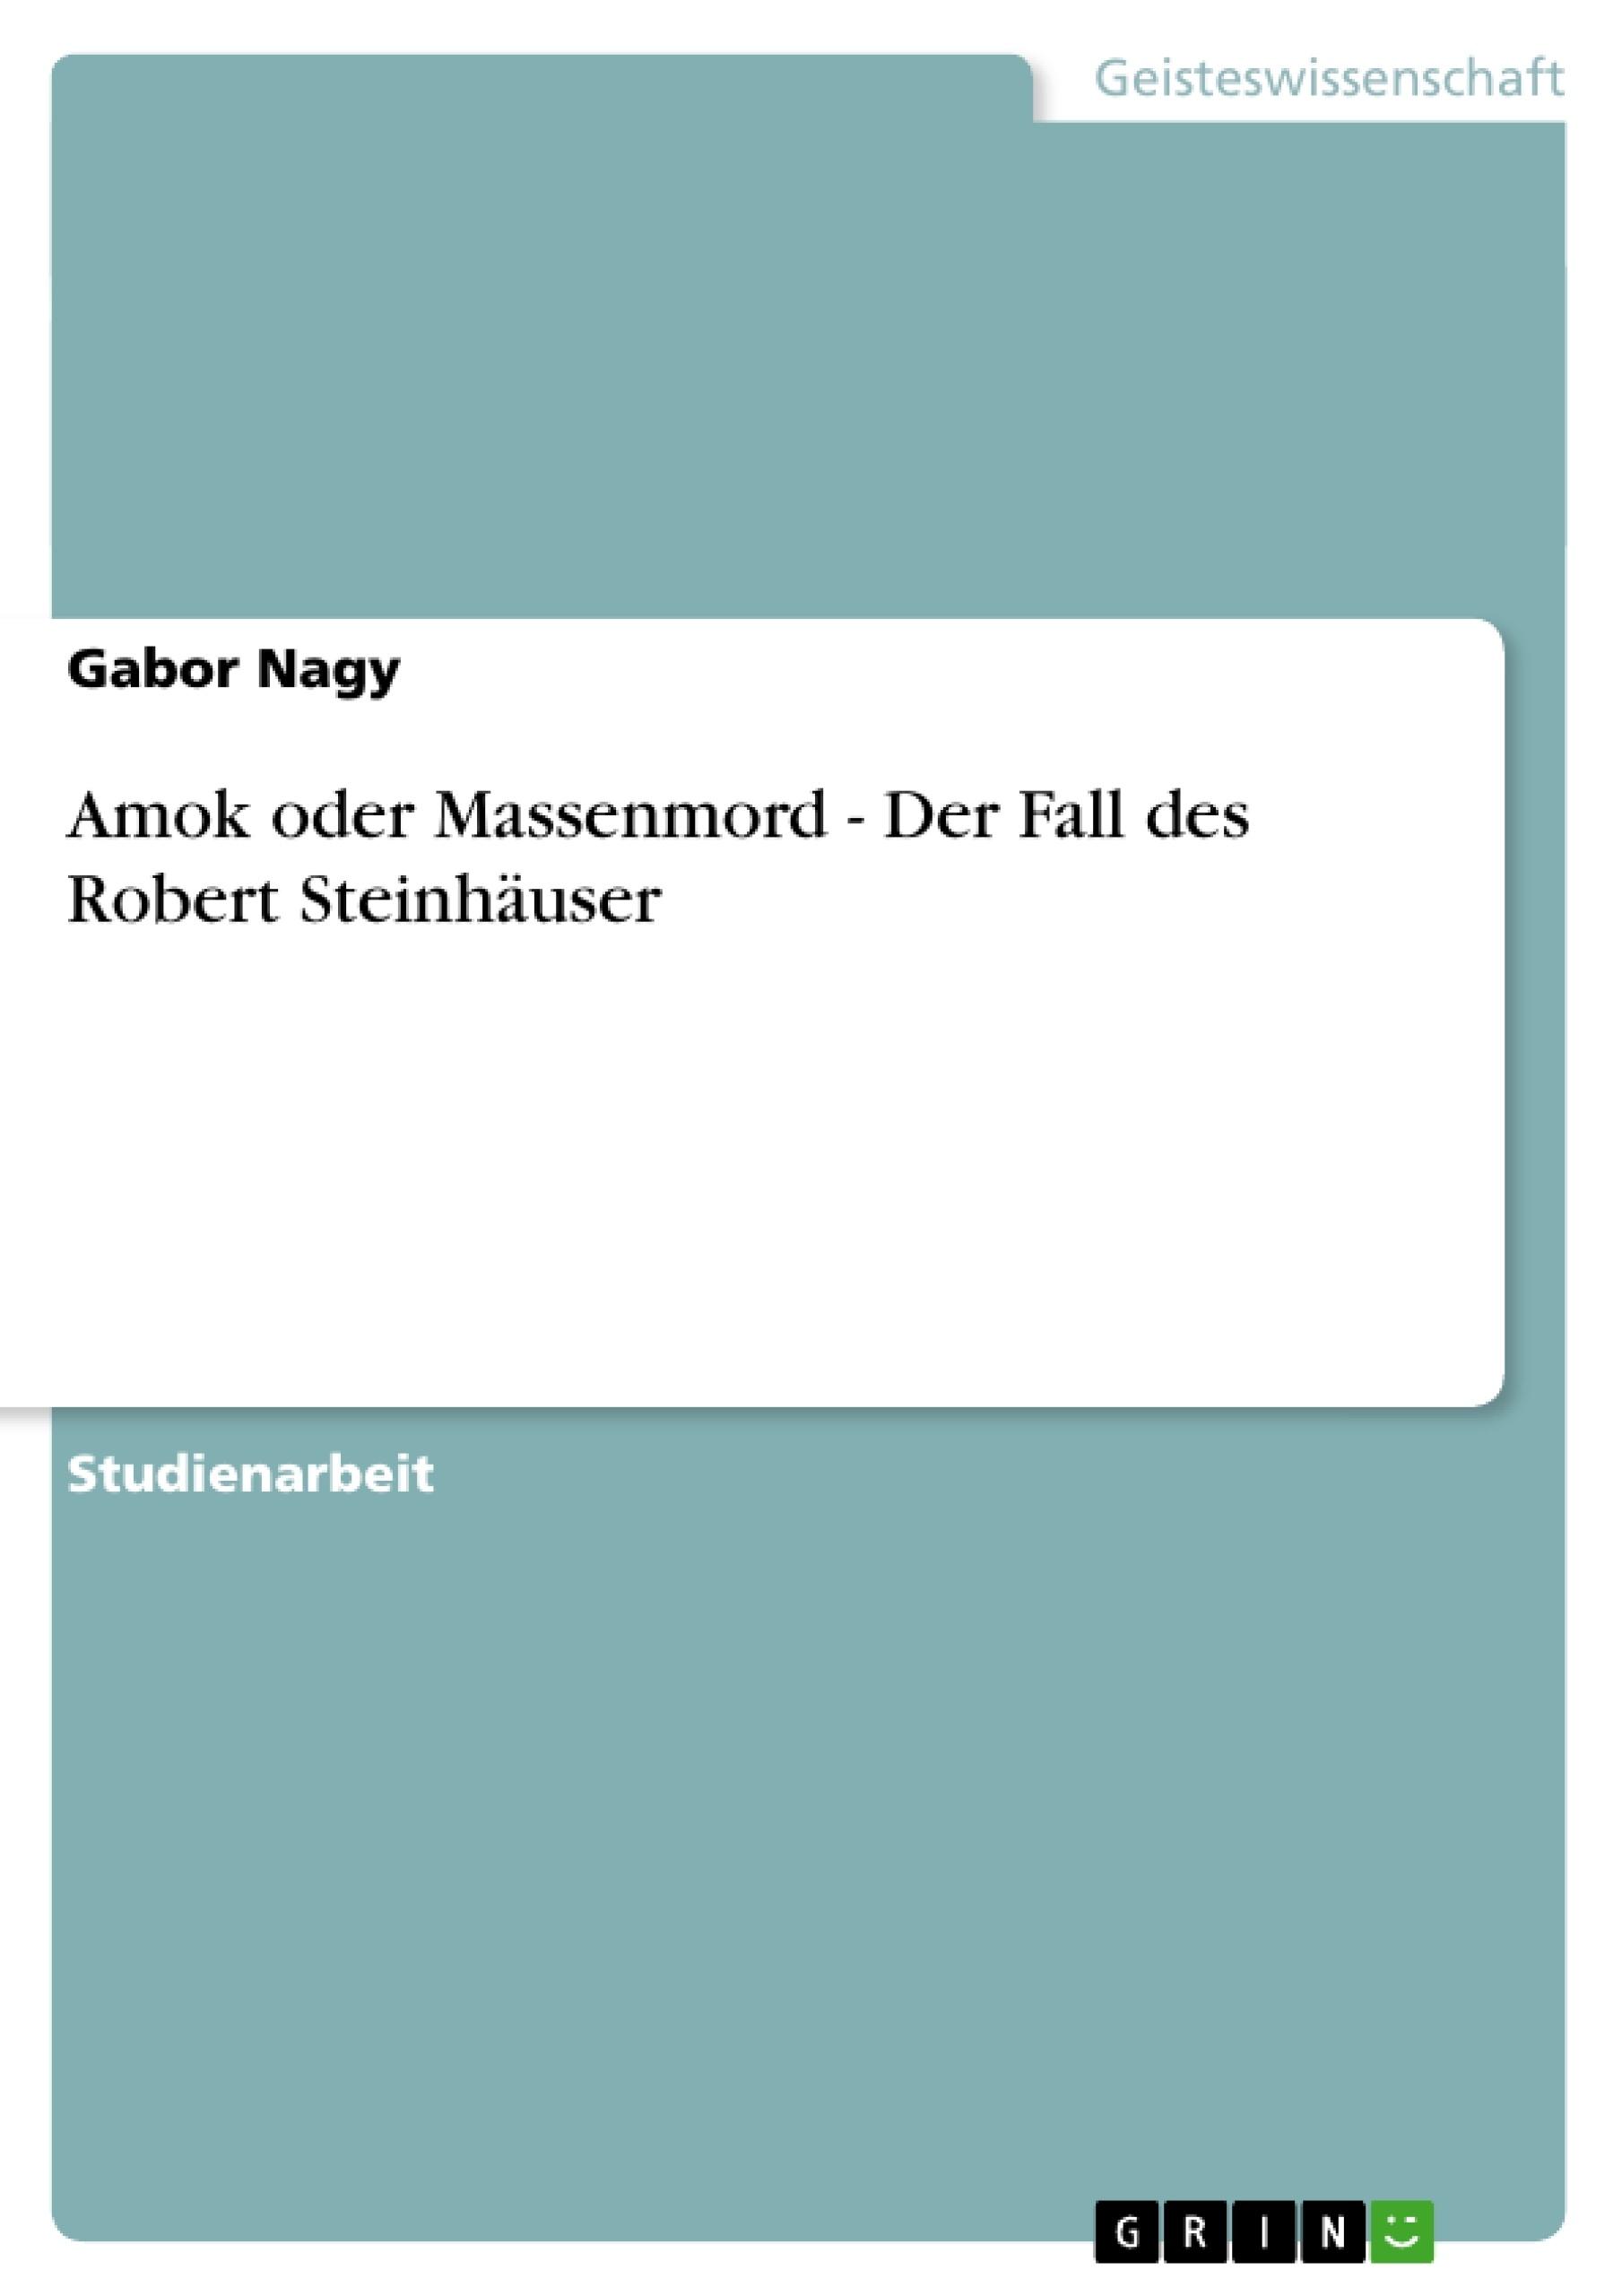 Titel: Amok oder Massenmord - Der Fall des Robert Steinhäuser